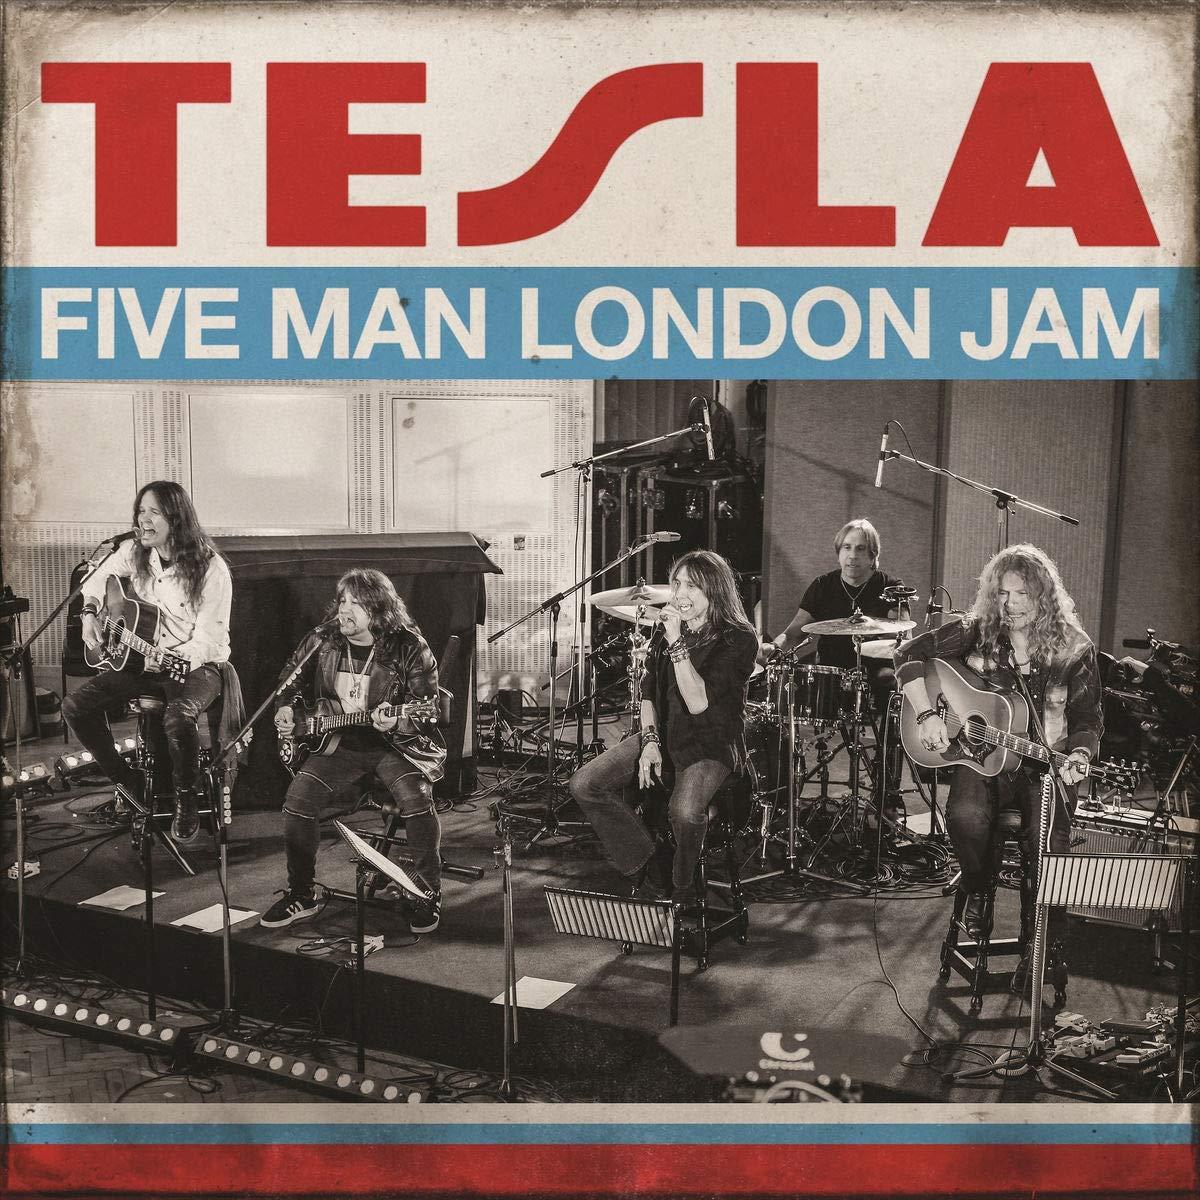 Tesla - Five Man London Jam (2020) [FLAC] Download